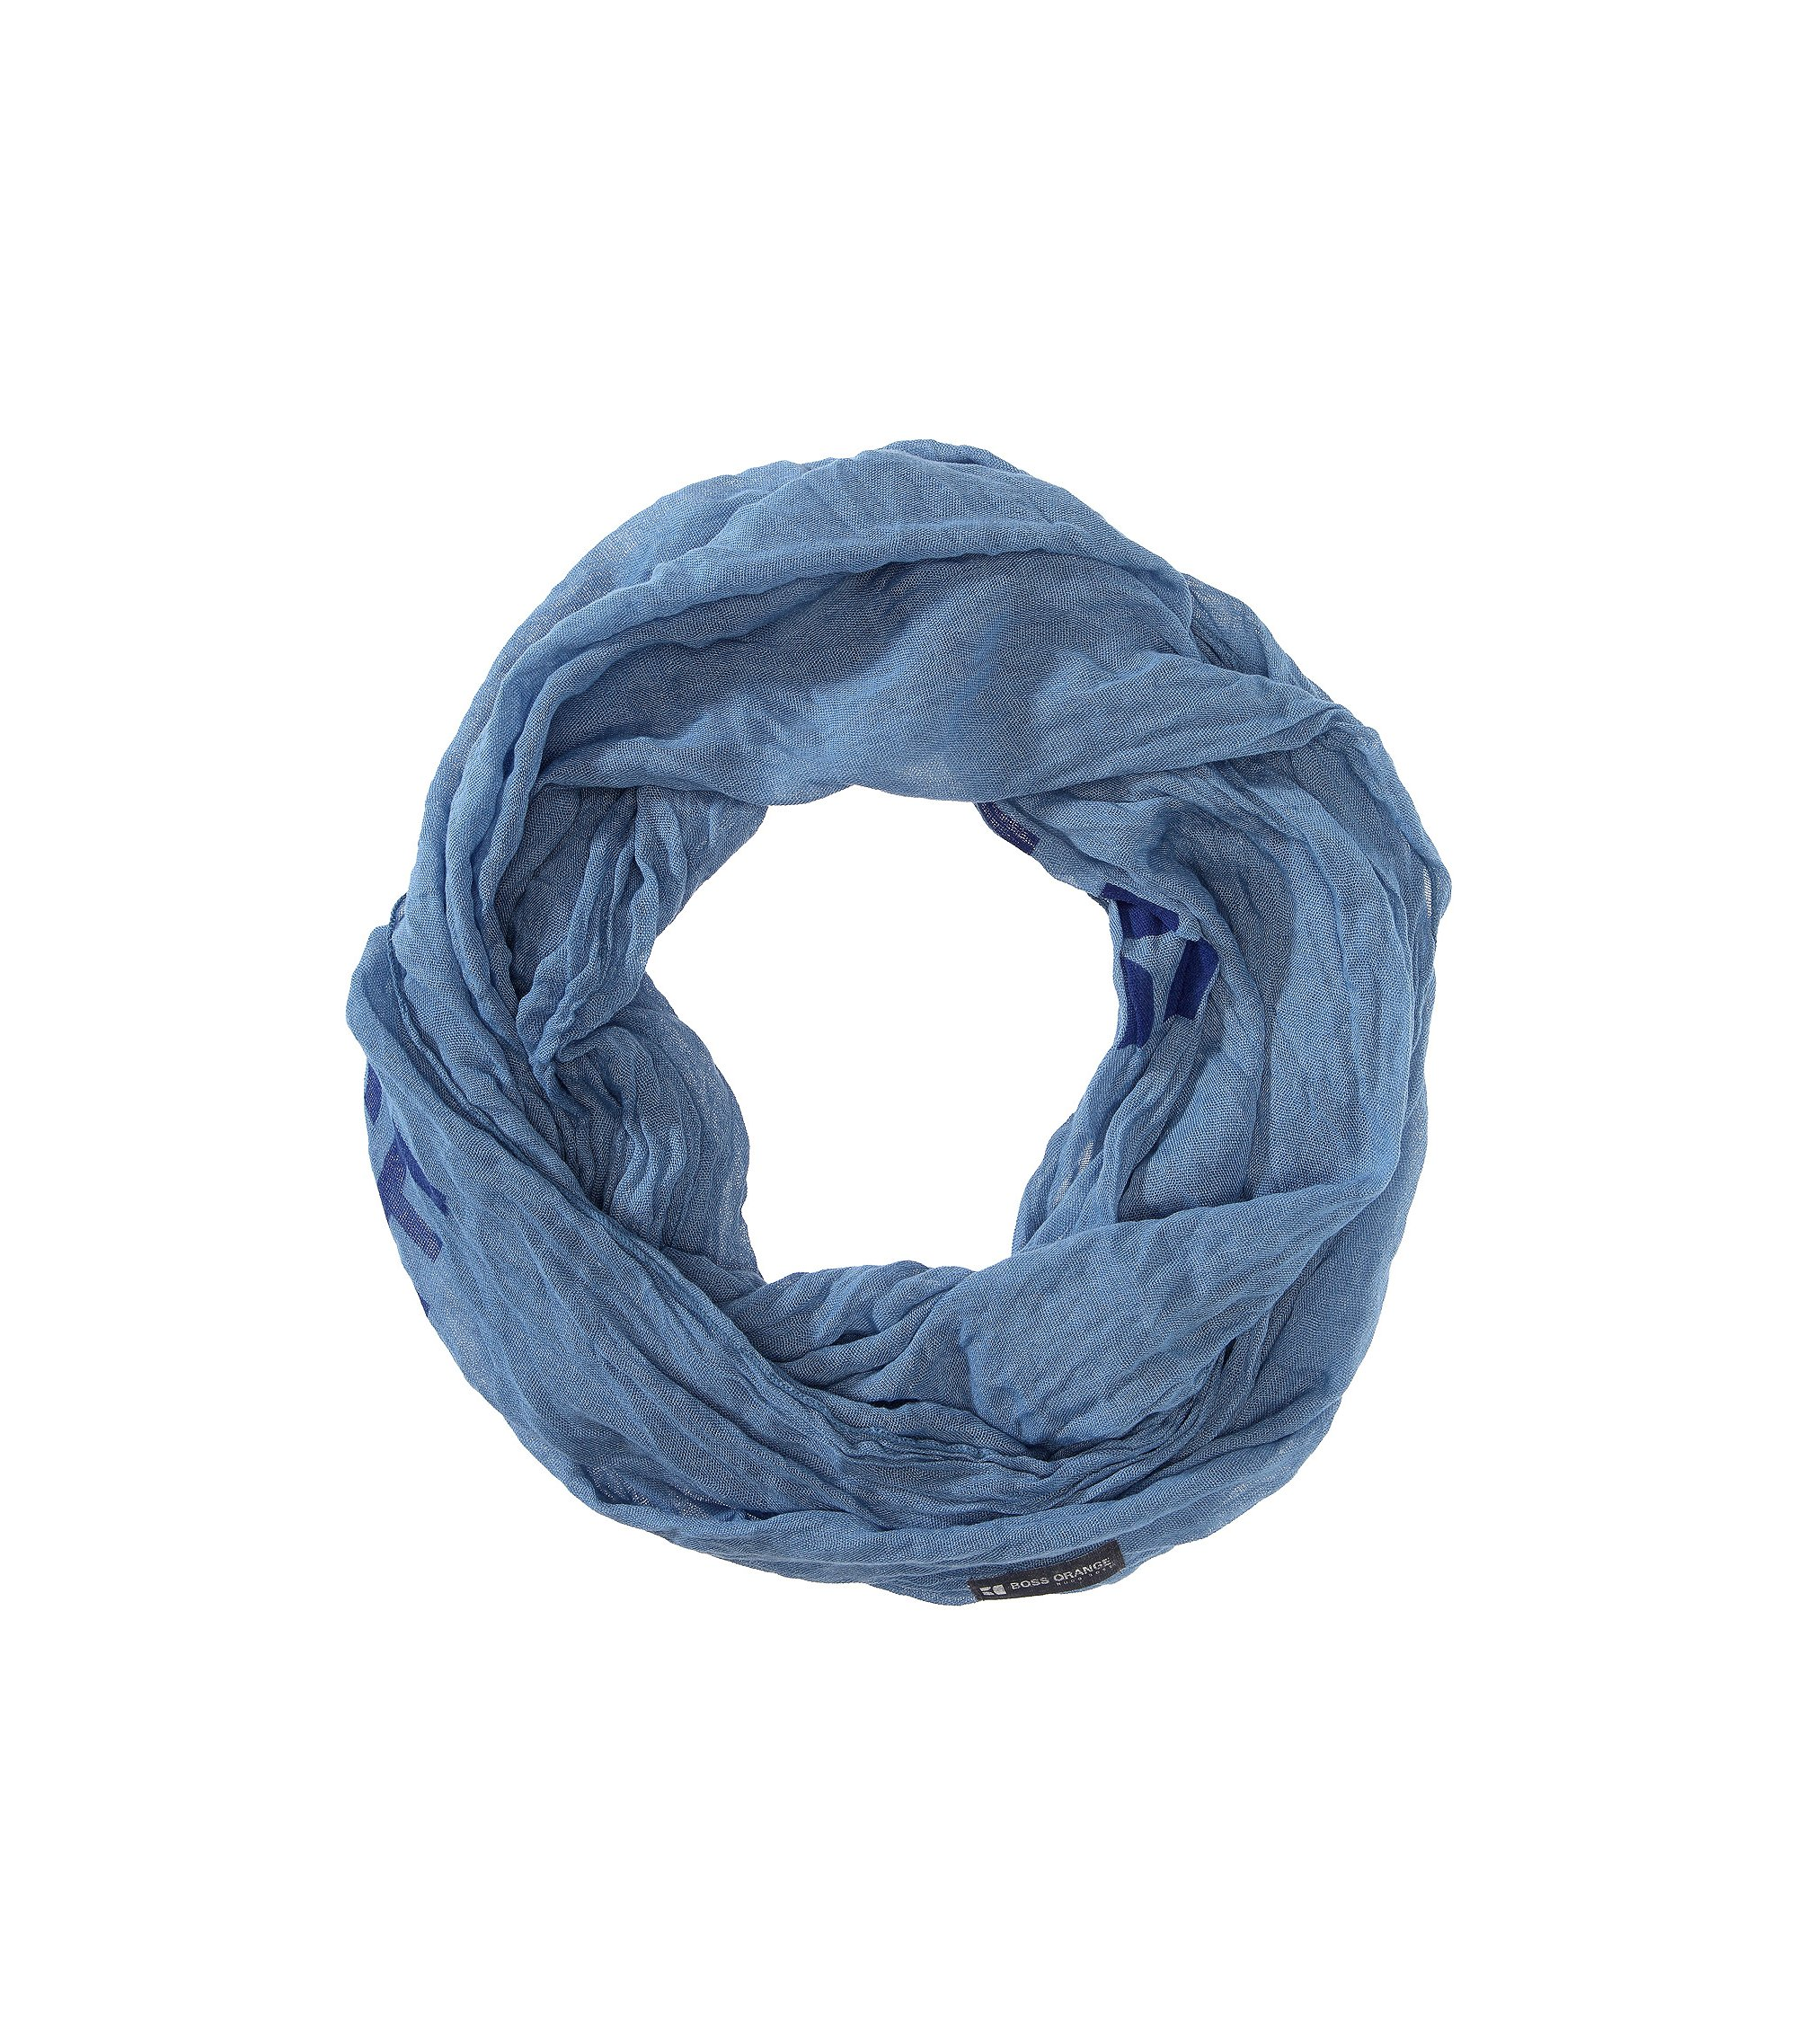 Loop-Schal ´Nuot1` mit Logo-Schriftzug, Blau